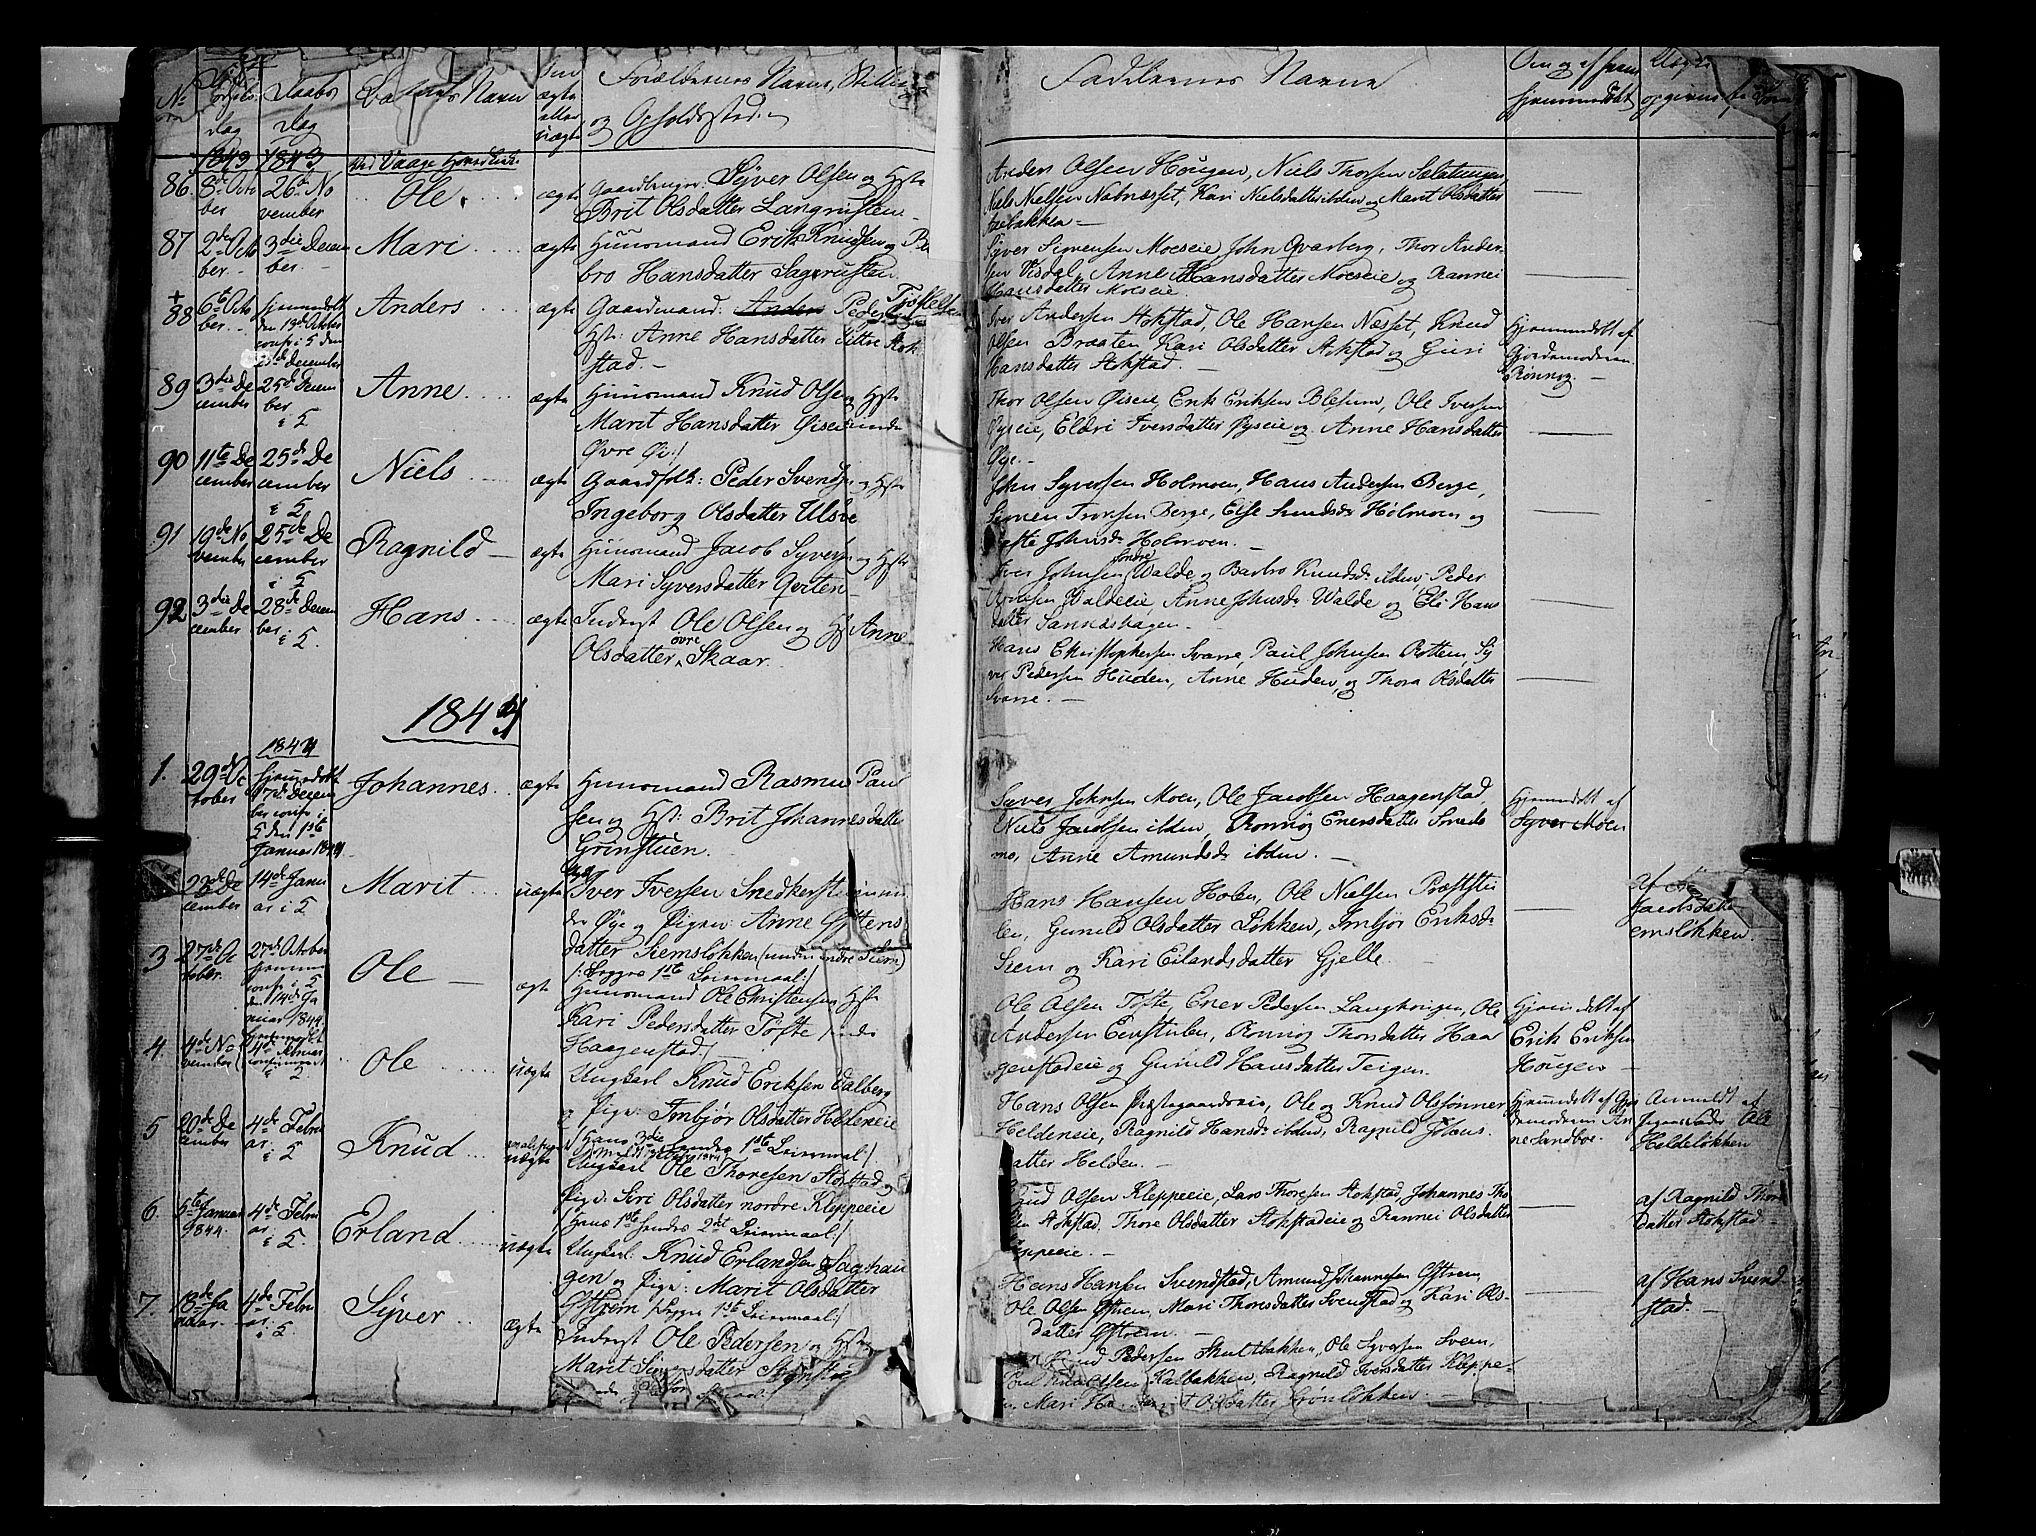 SAH, Vågå prestekontor, Ministerialbok nr. 5 /1, 1842-1856, s. 11